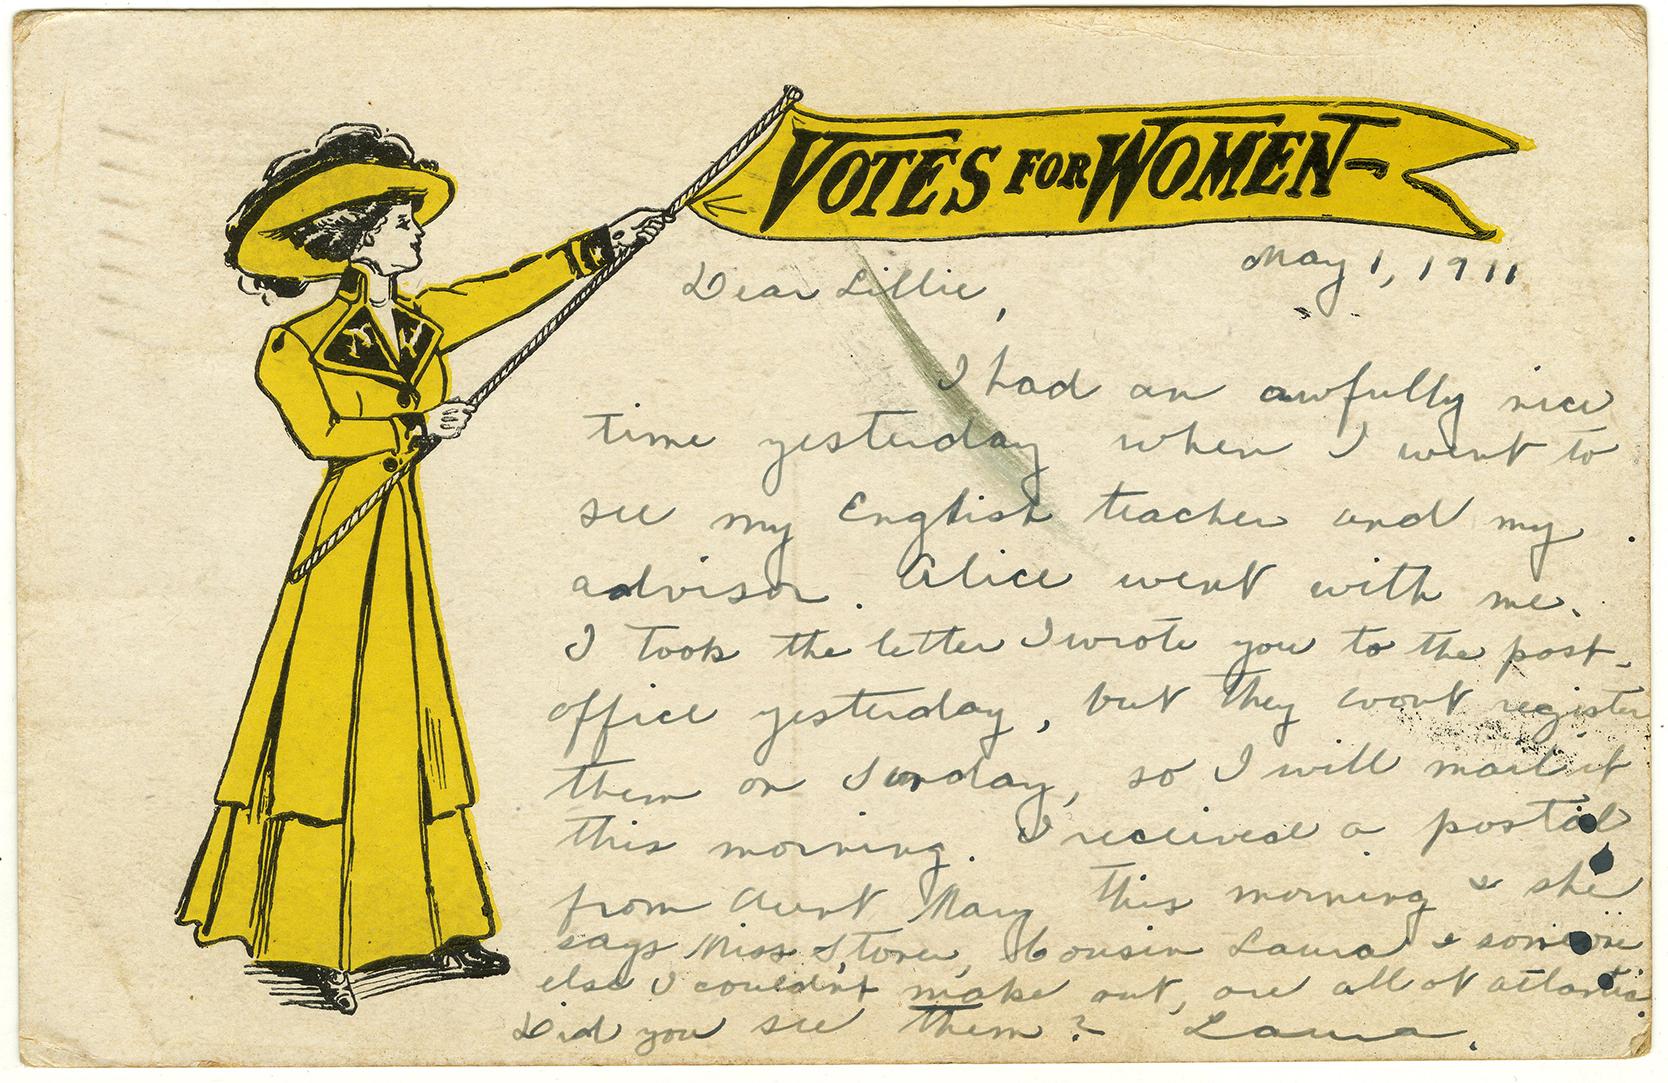 Votes for Women postcard